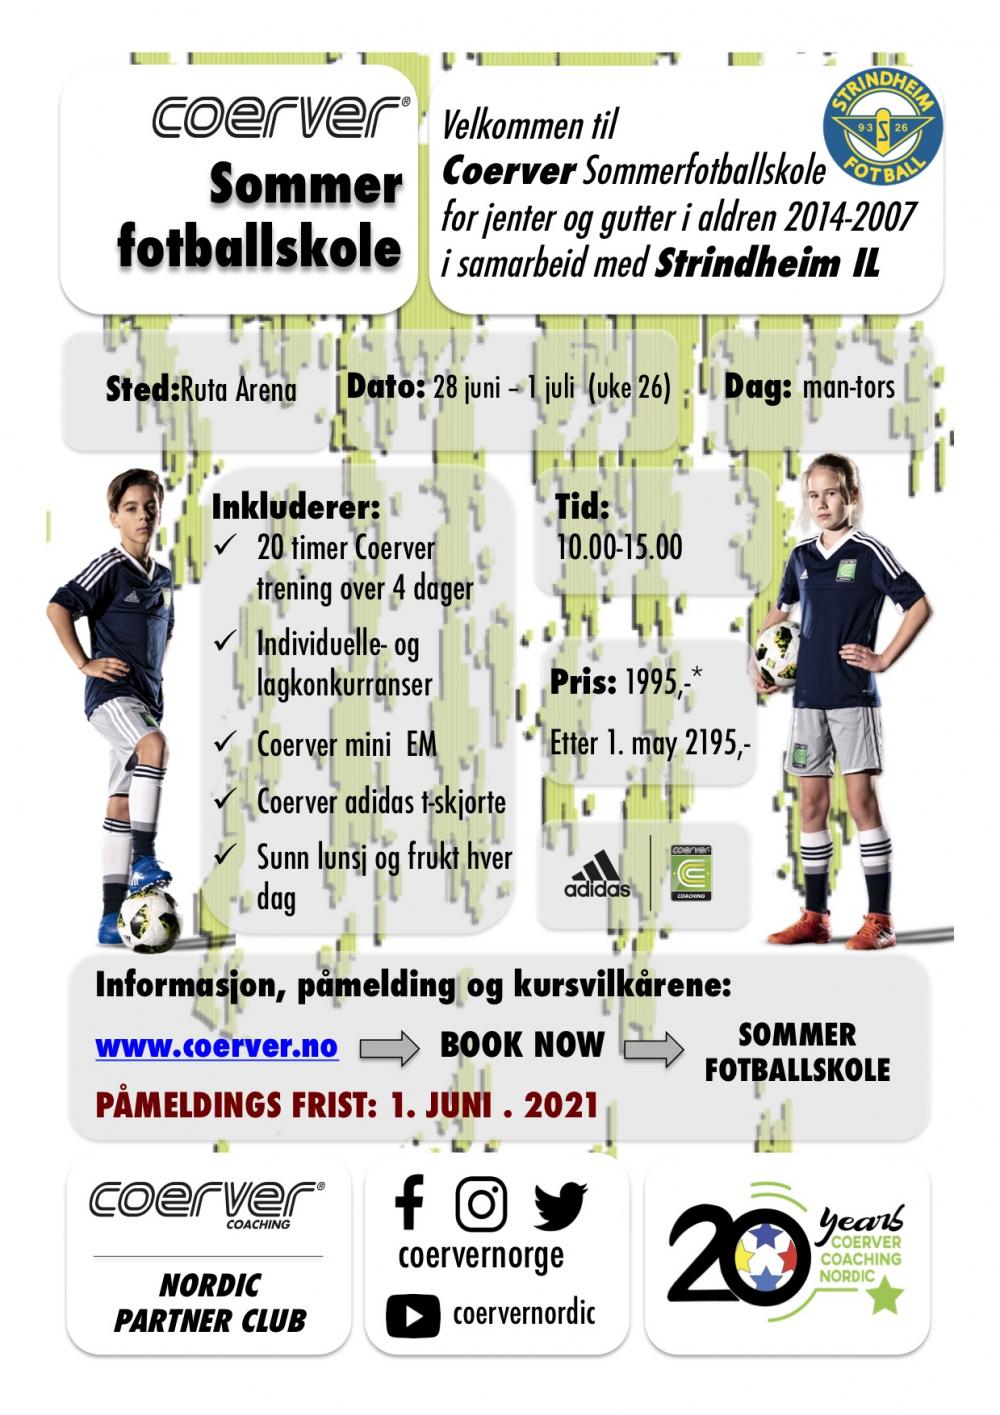 Coerver Sommerfotballskole 2021 (UKE 26) Trondheim